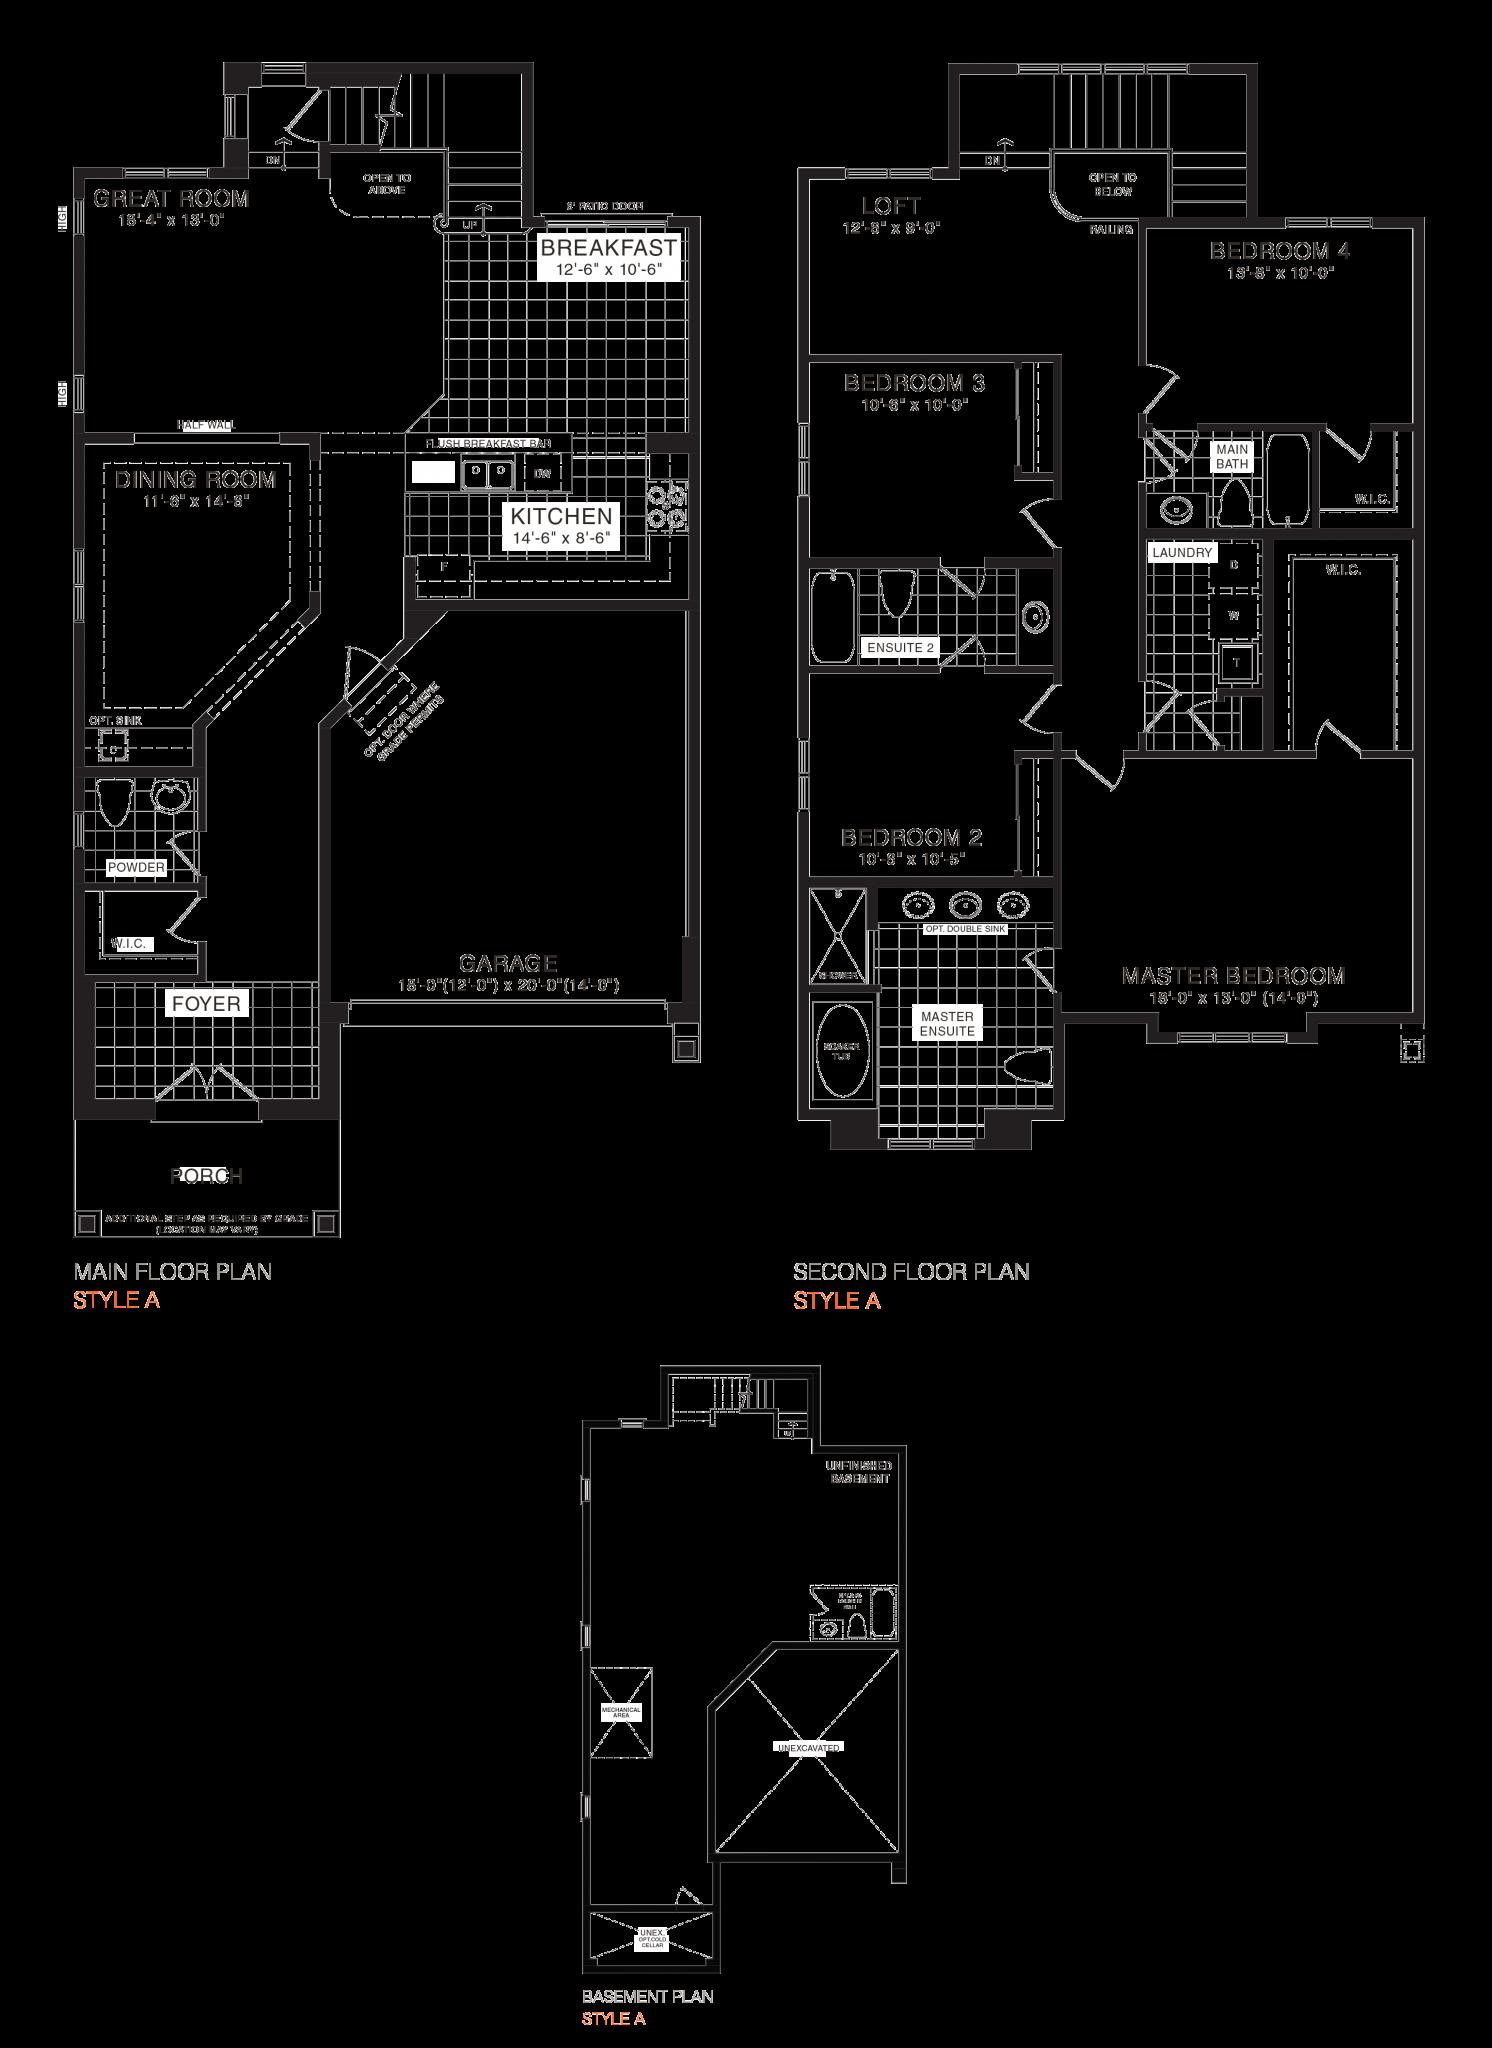 28096-Honeysuckle-v2-floorplan